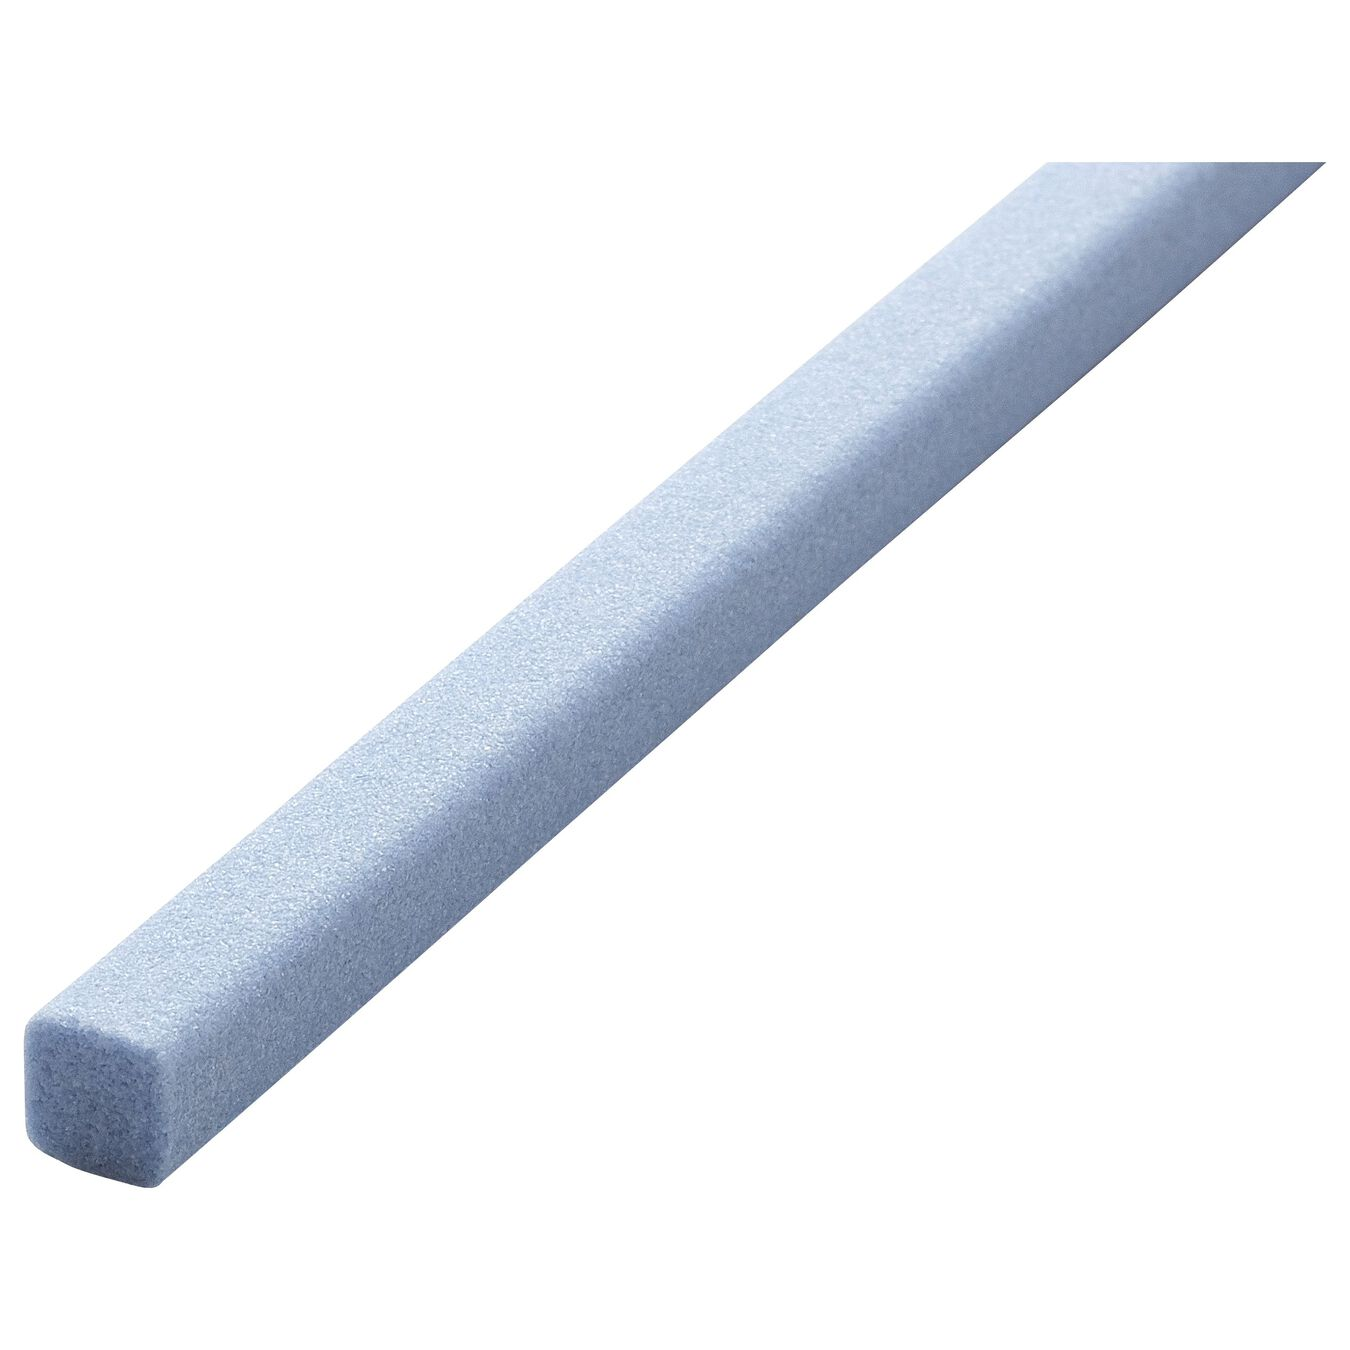 Sharpening rod, 2 cm   blue   ceramic,,large 2